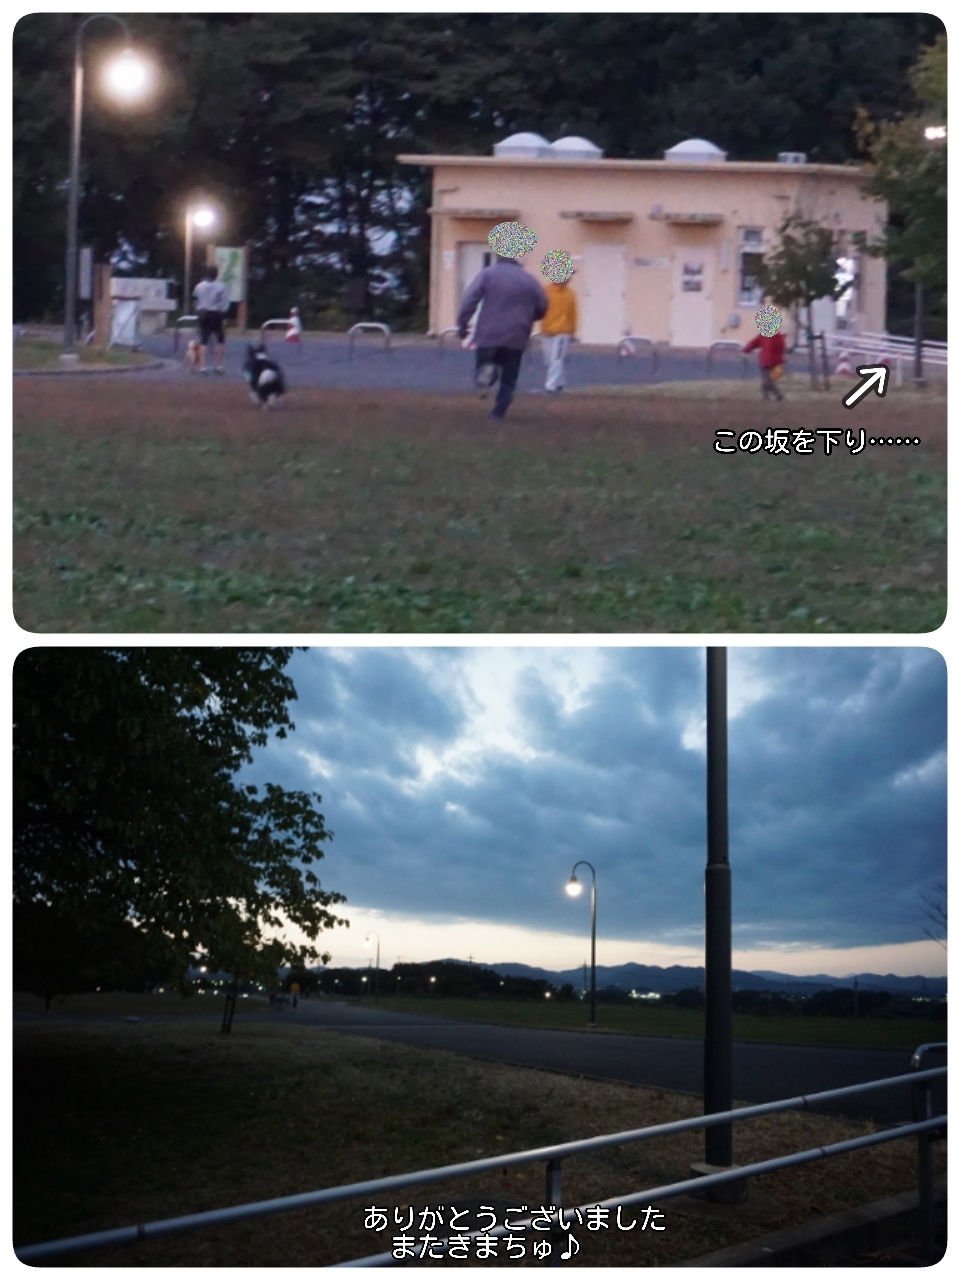 16-11-07-01-11-30-804_deco.jpg